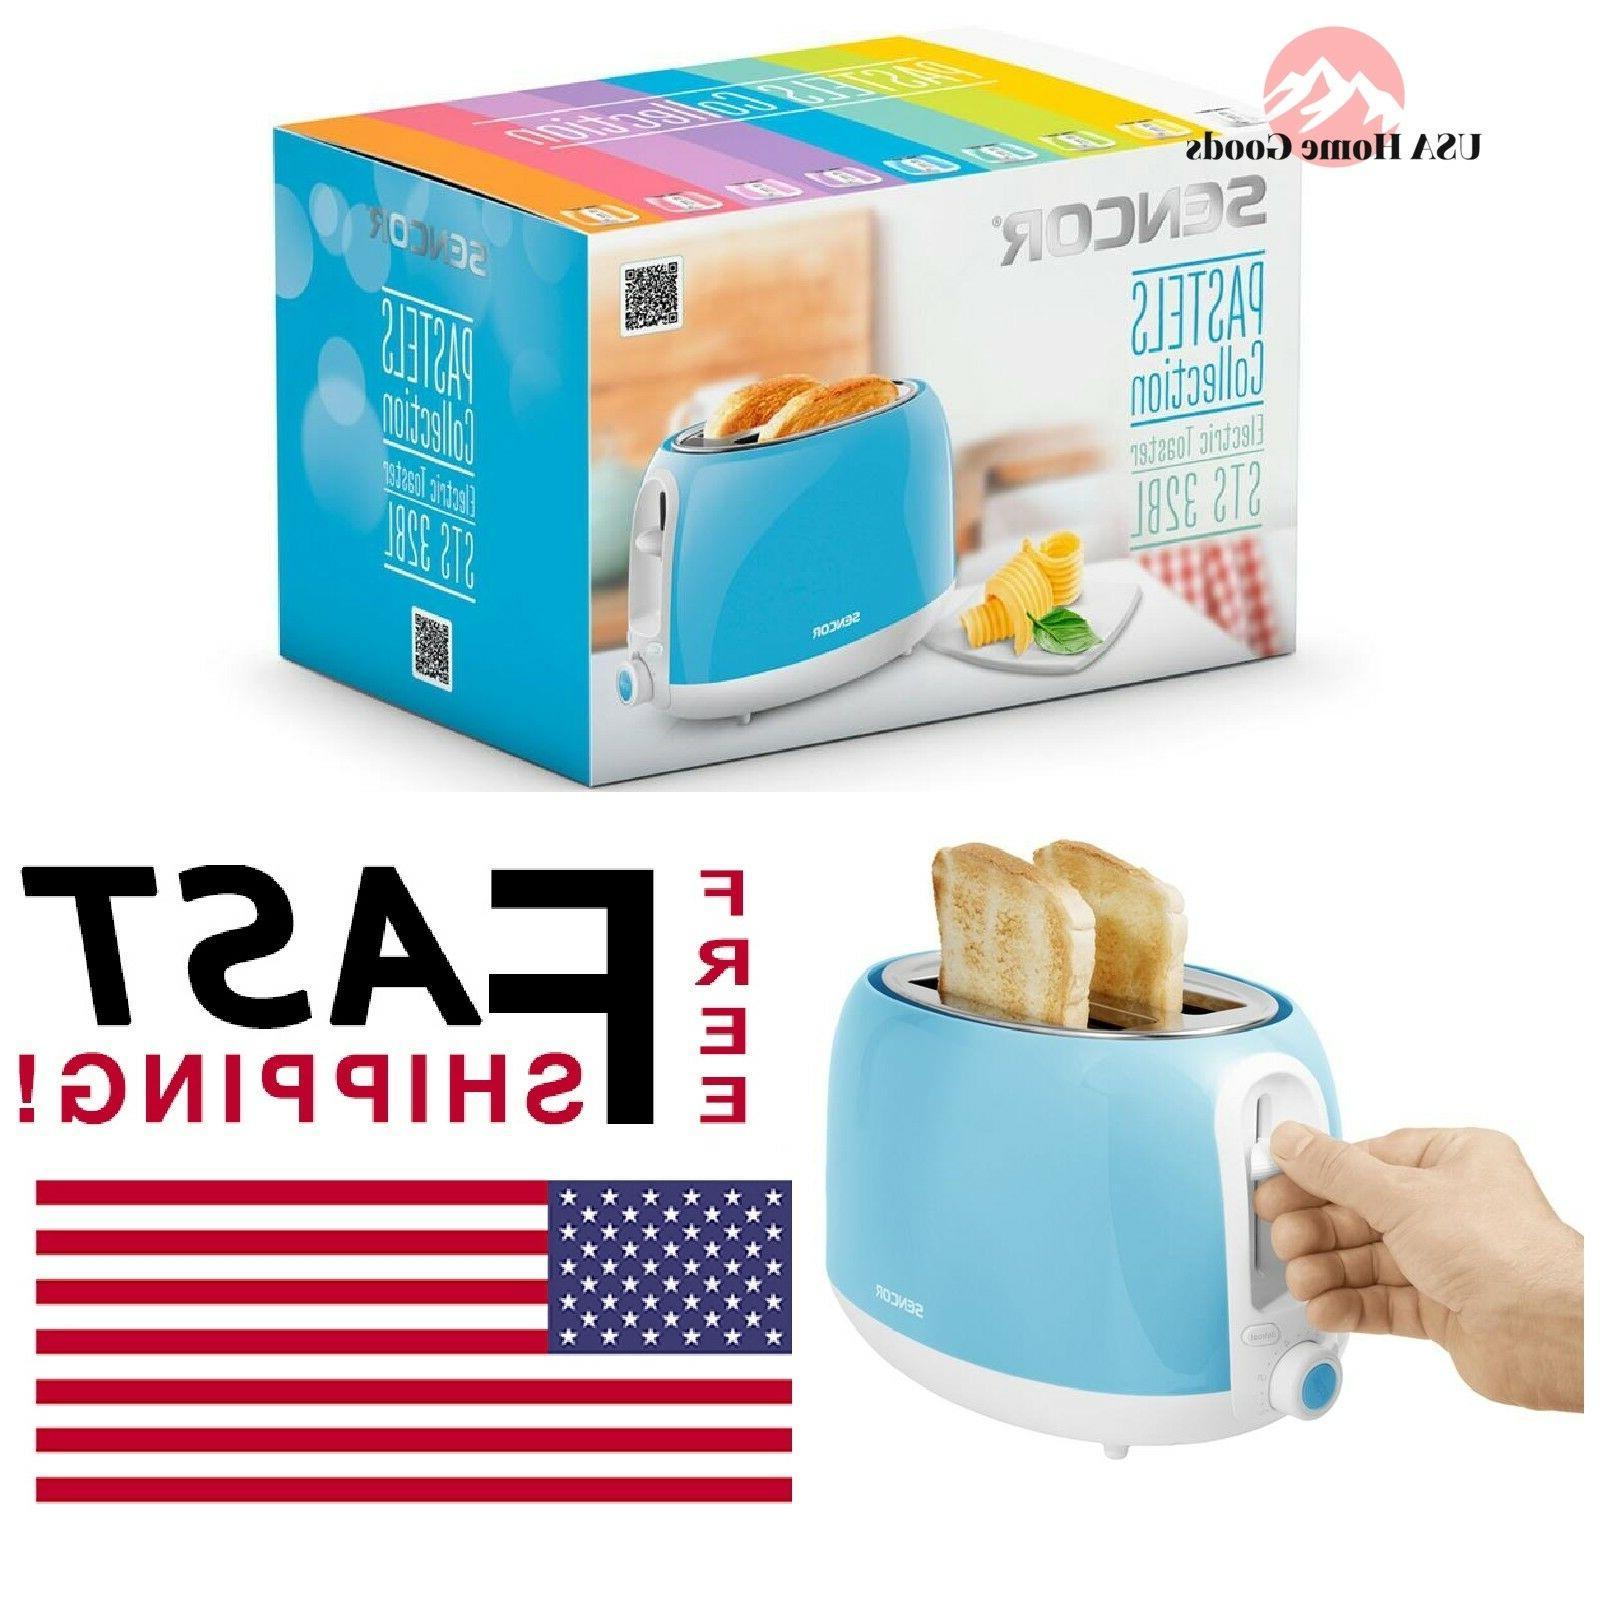 Sencor - Sts 2-slice Regular-slot Toaster - Blue